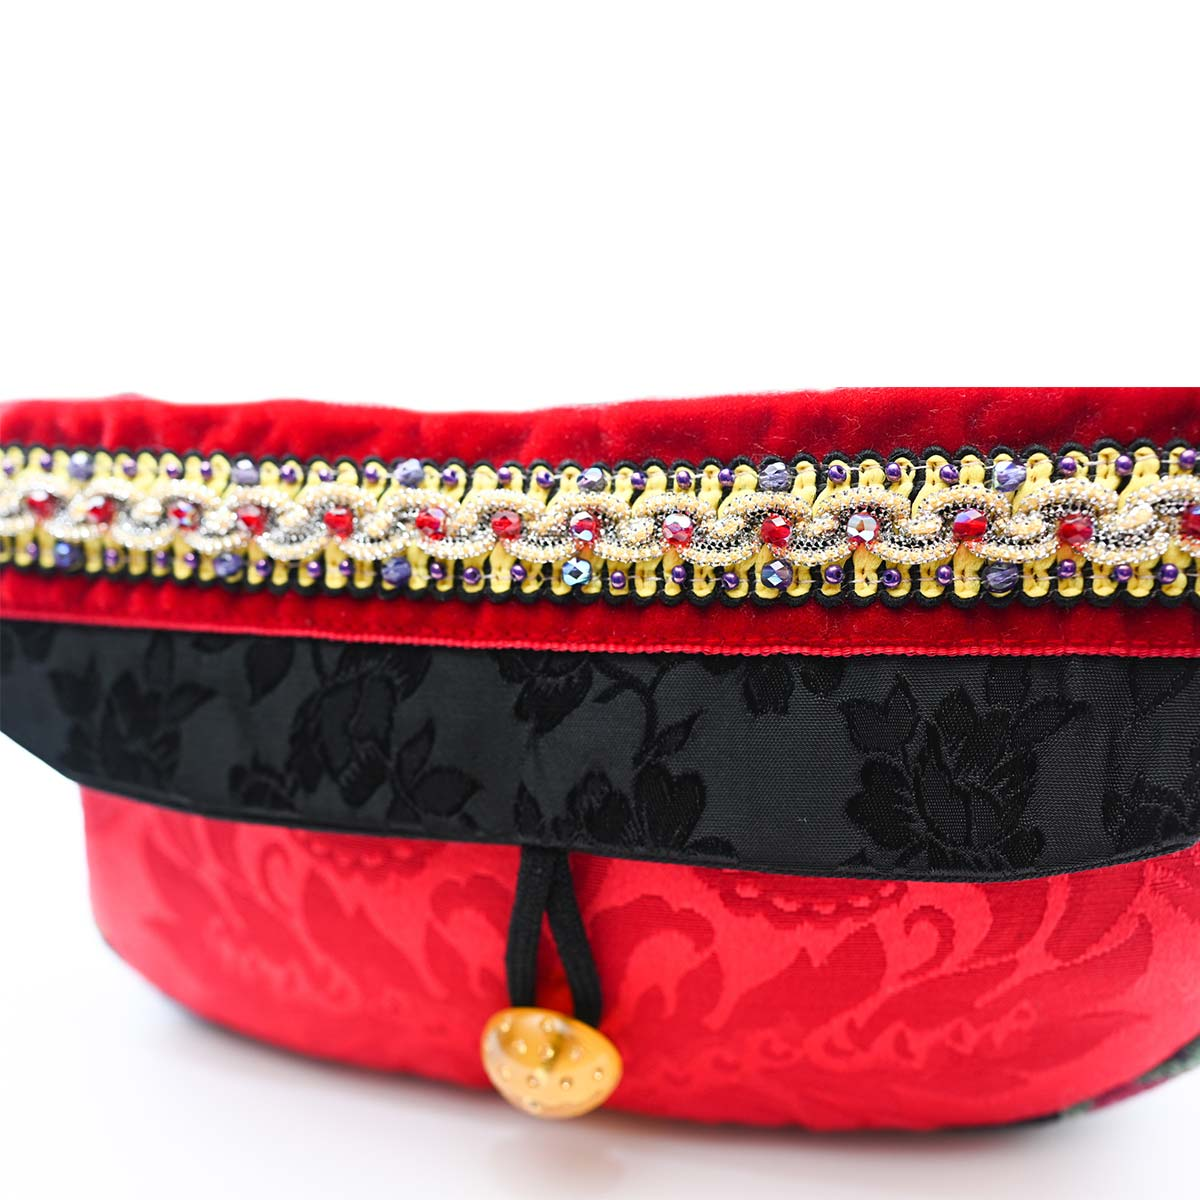 cruise bag red black DSC 6374